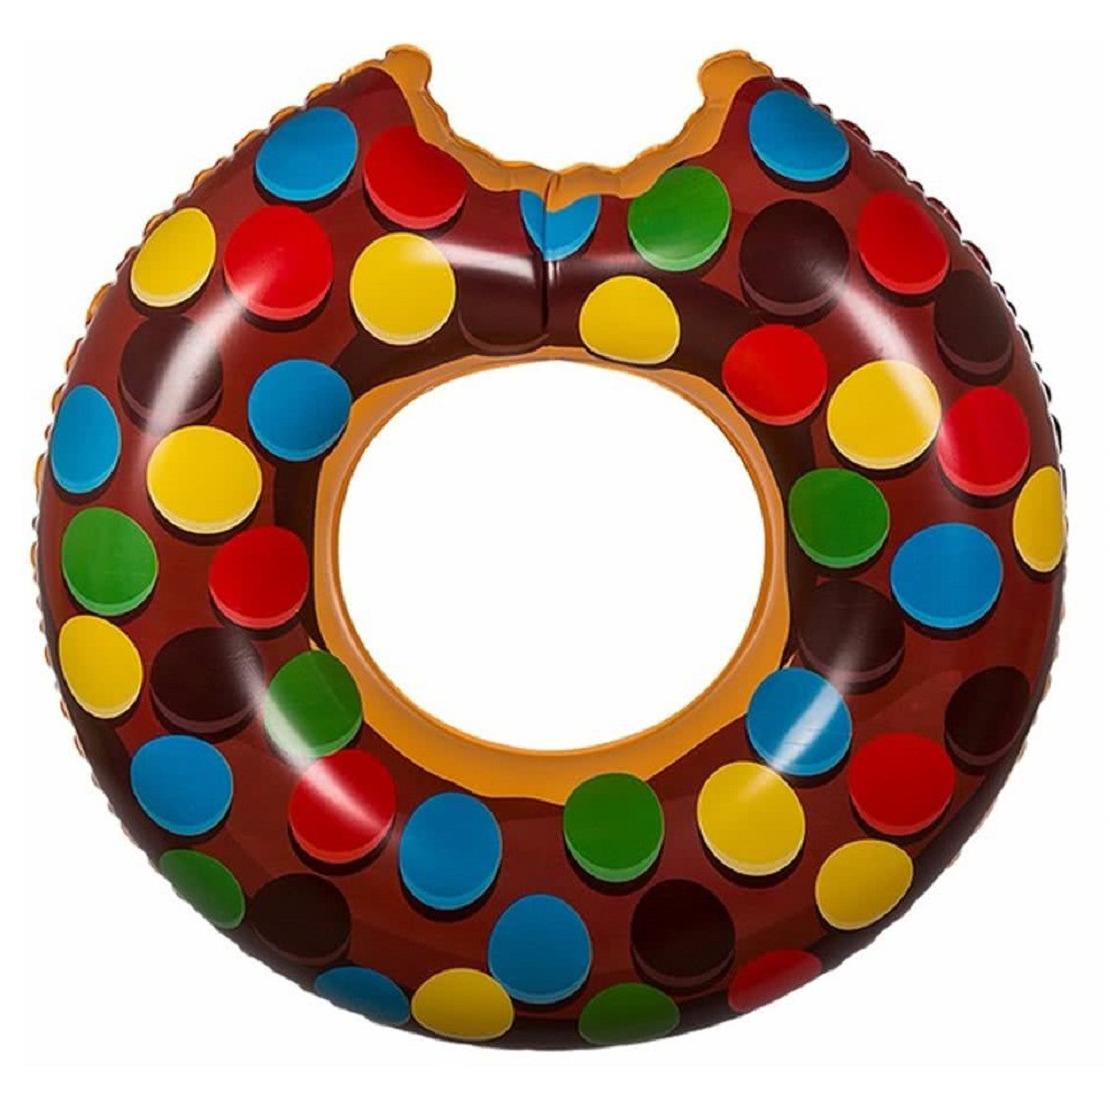 Donut zwemring bruin met spikkels 119 cm